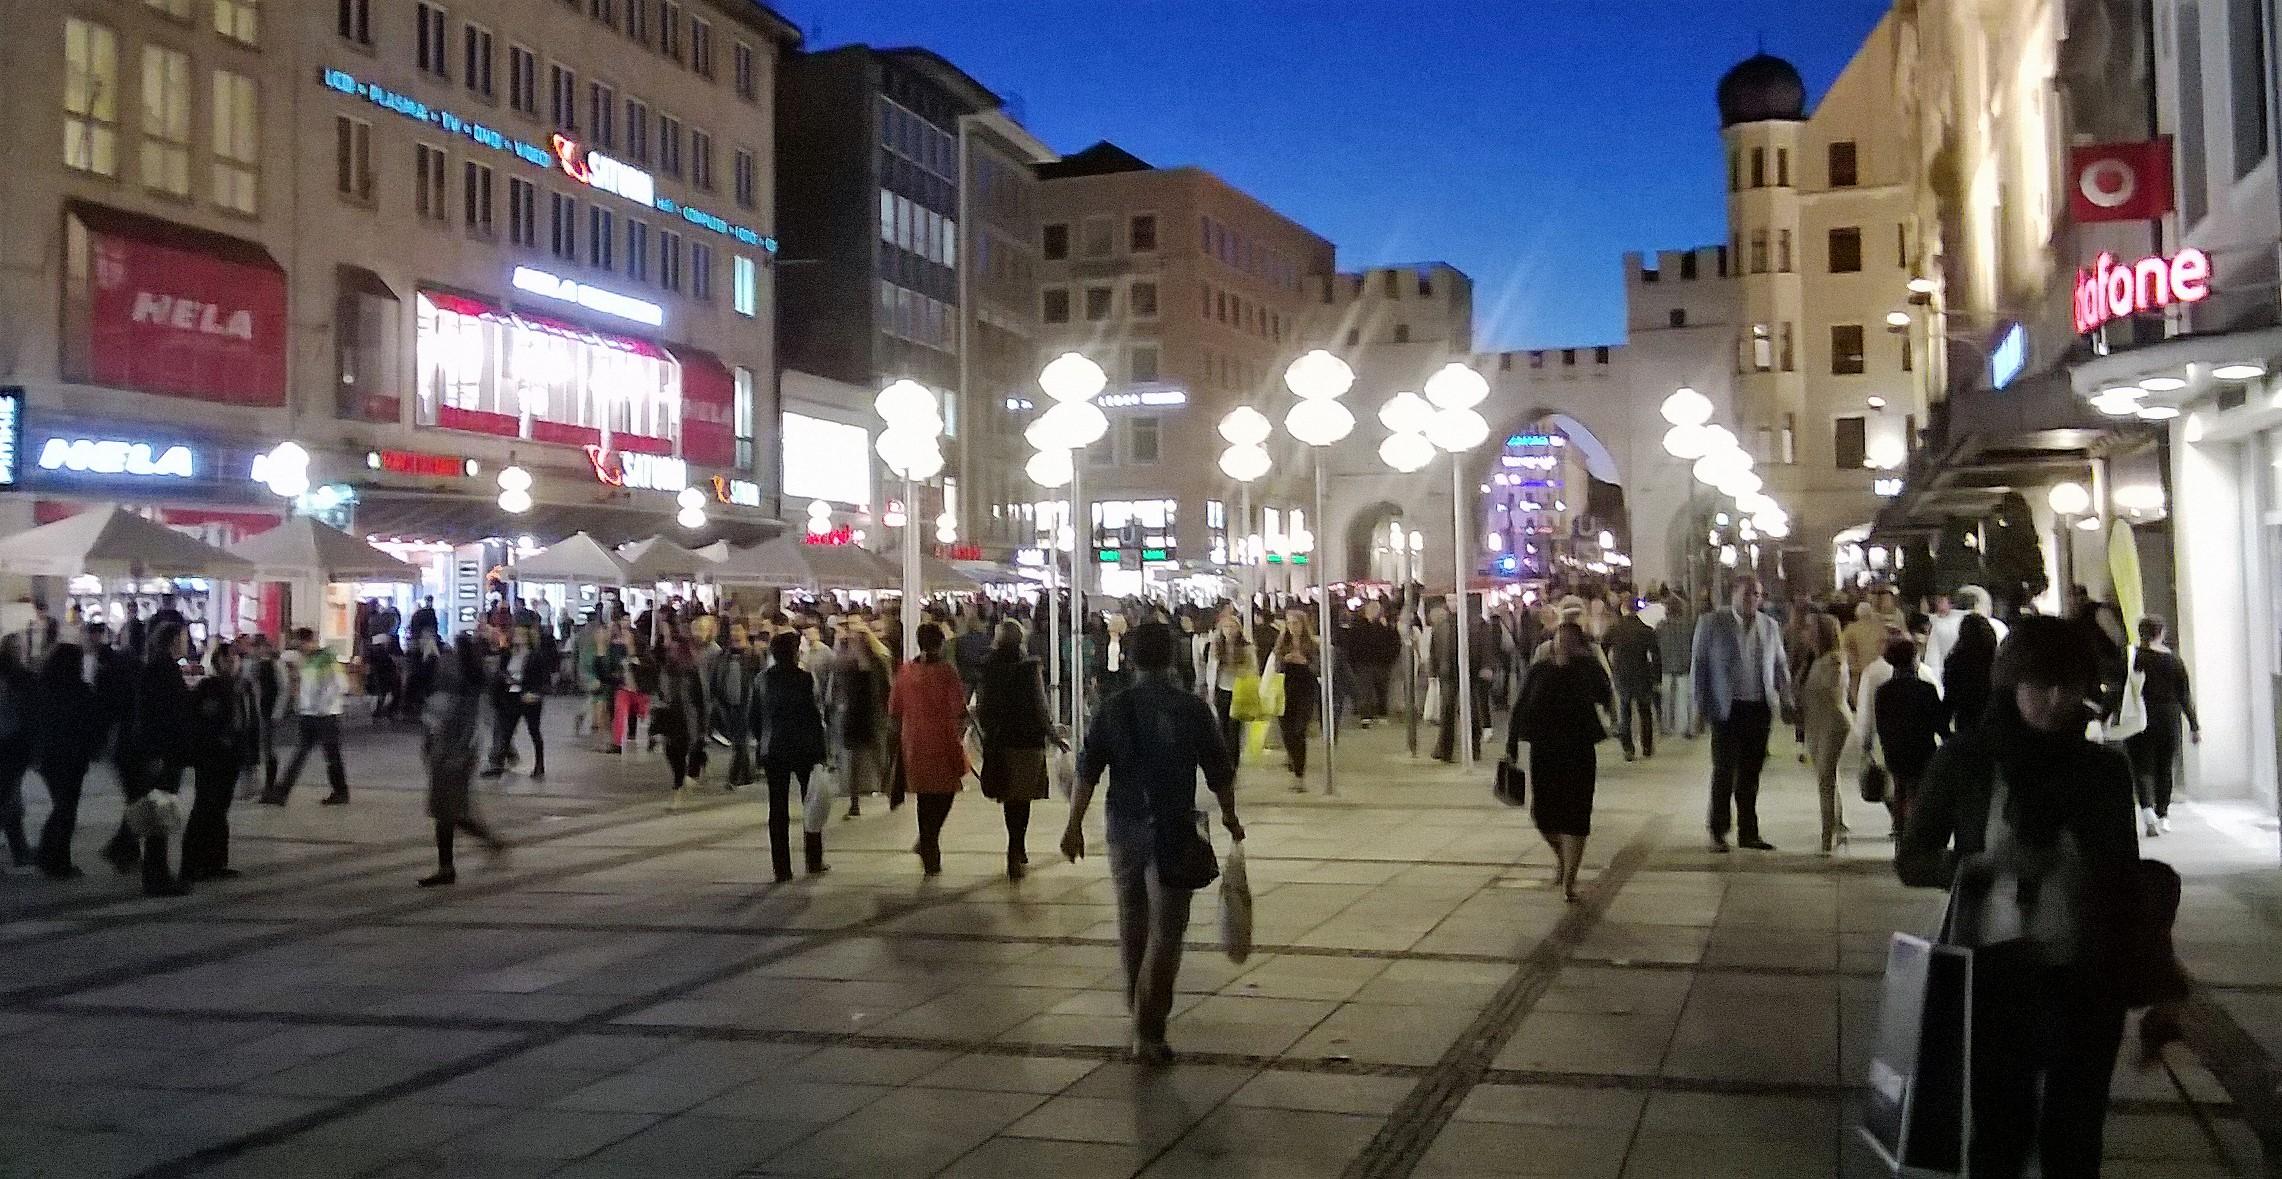 Shopping in Munich, Germany